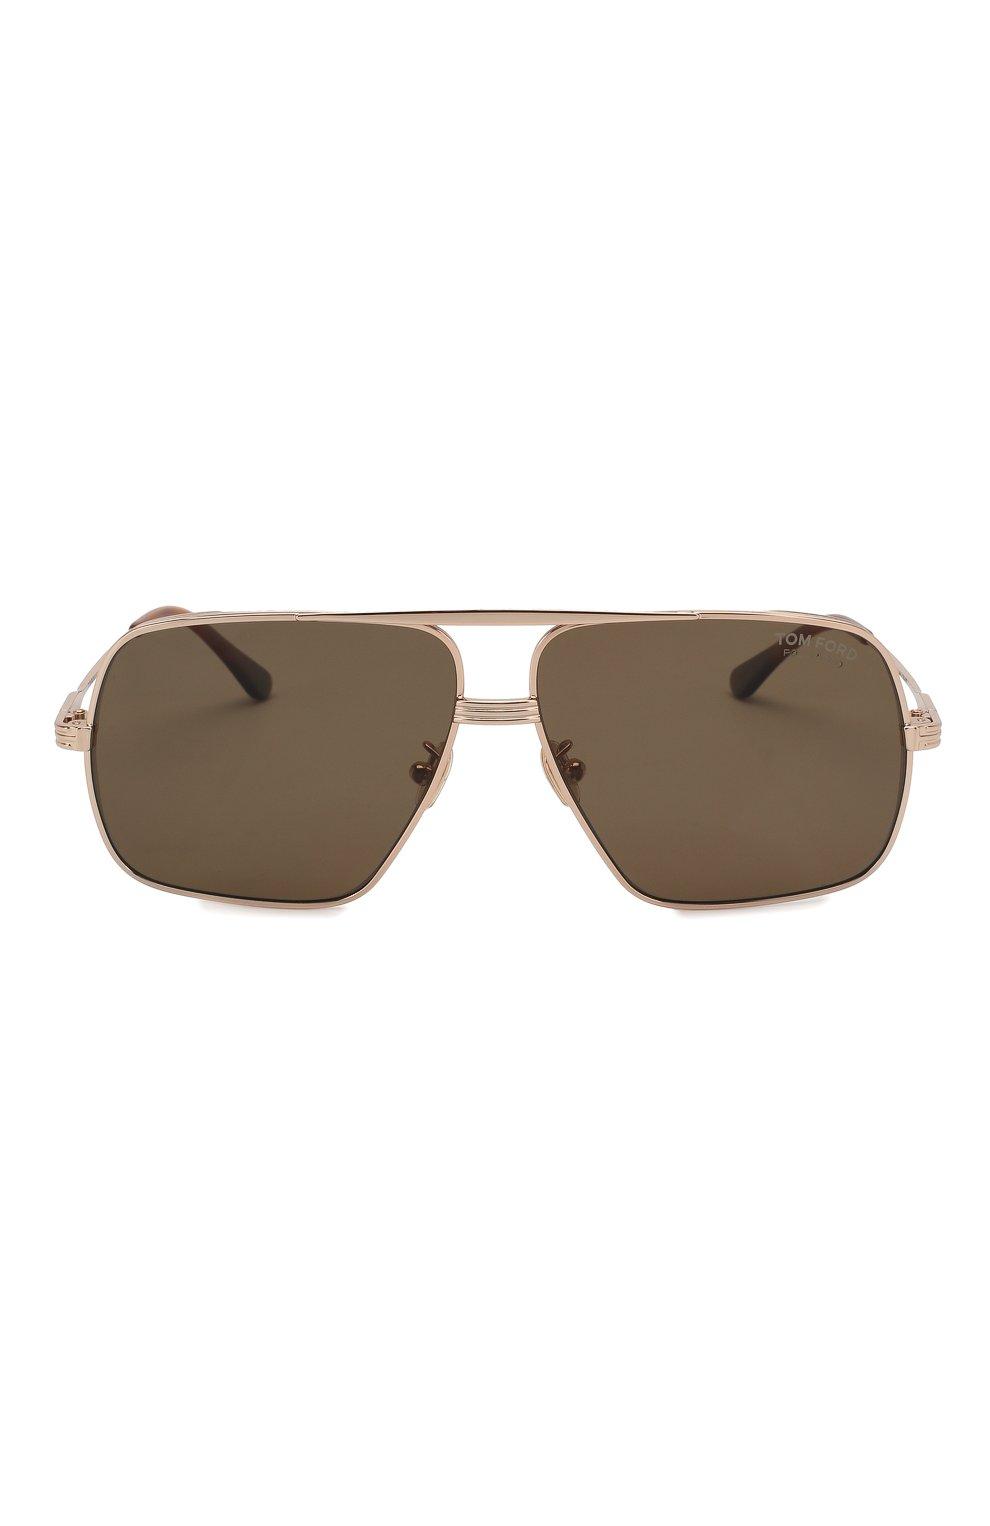 Мужские солнцезащитные очки TOM FORD золотого цвета, арт. TF735-H 28M   Фото 2